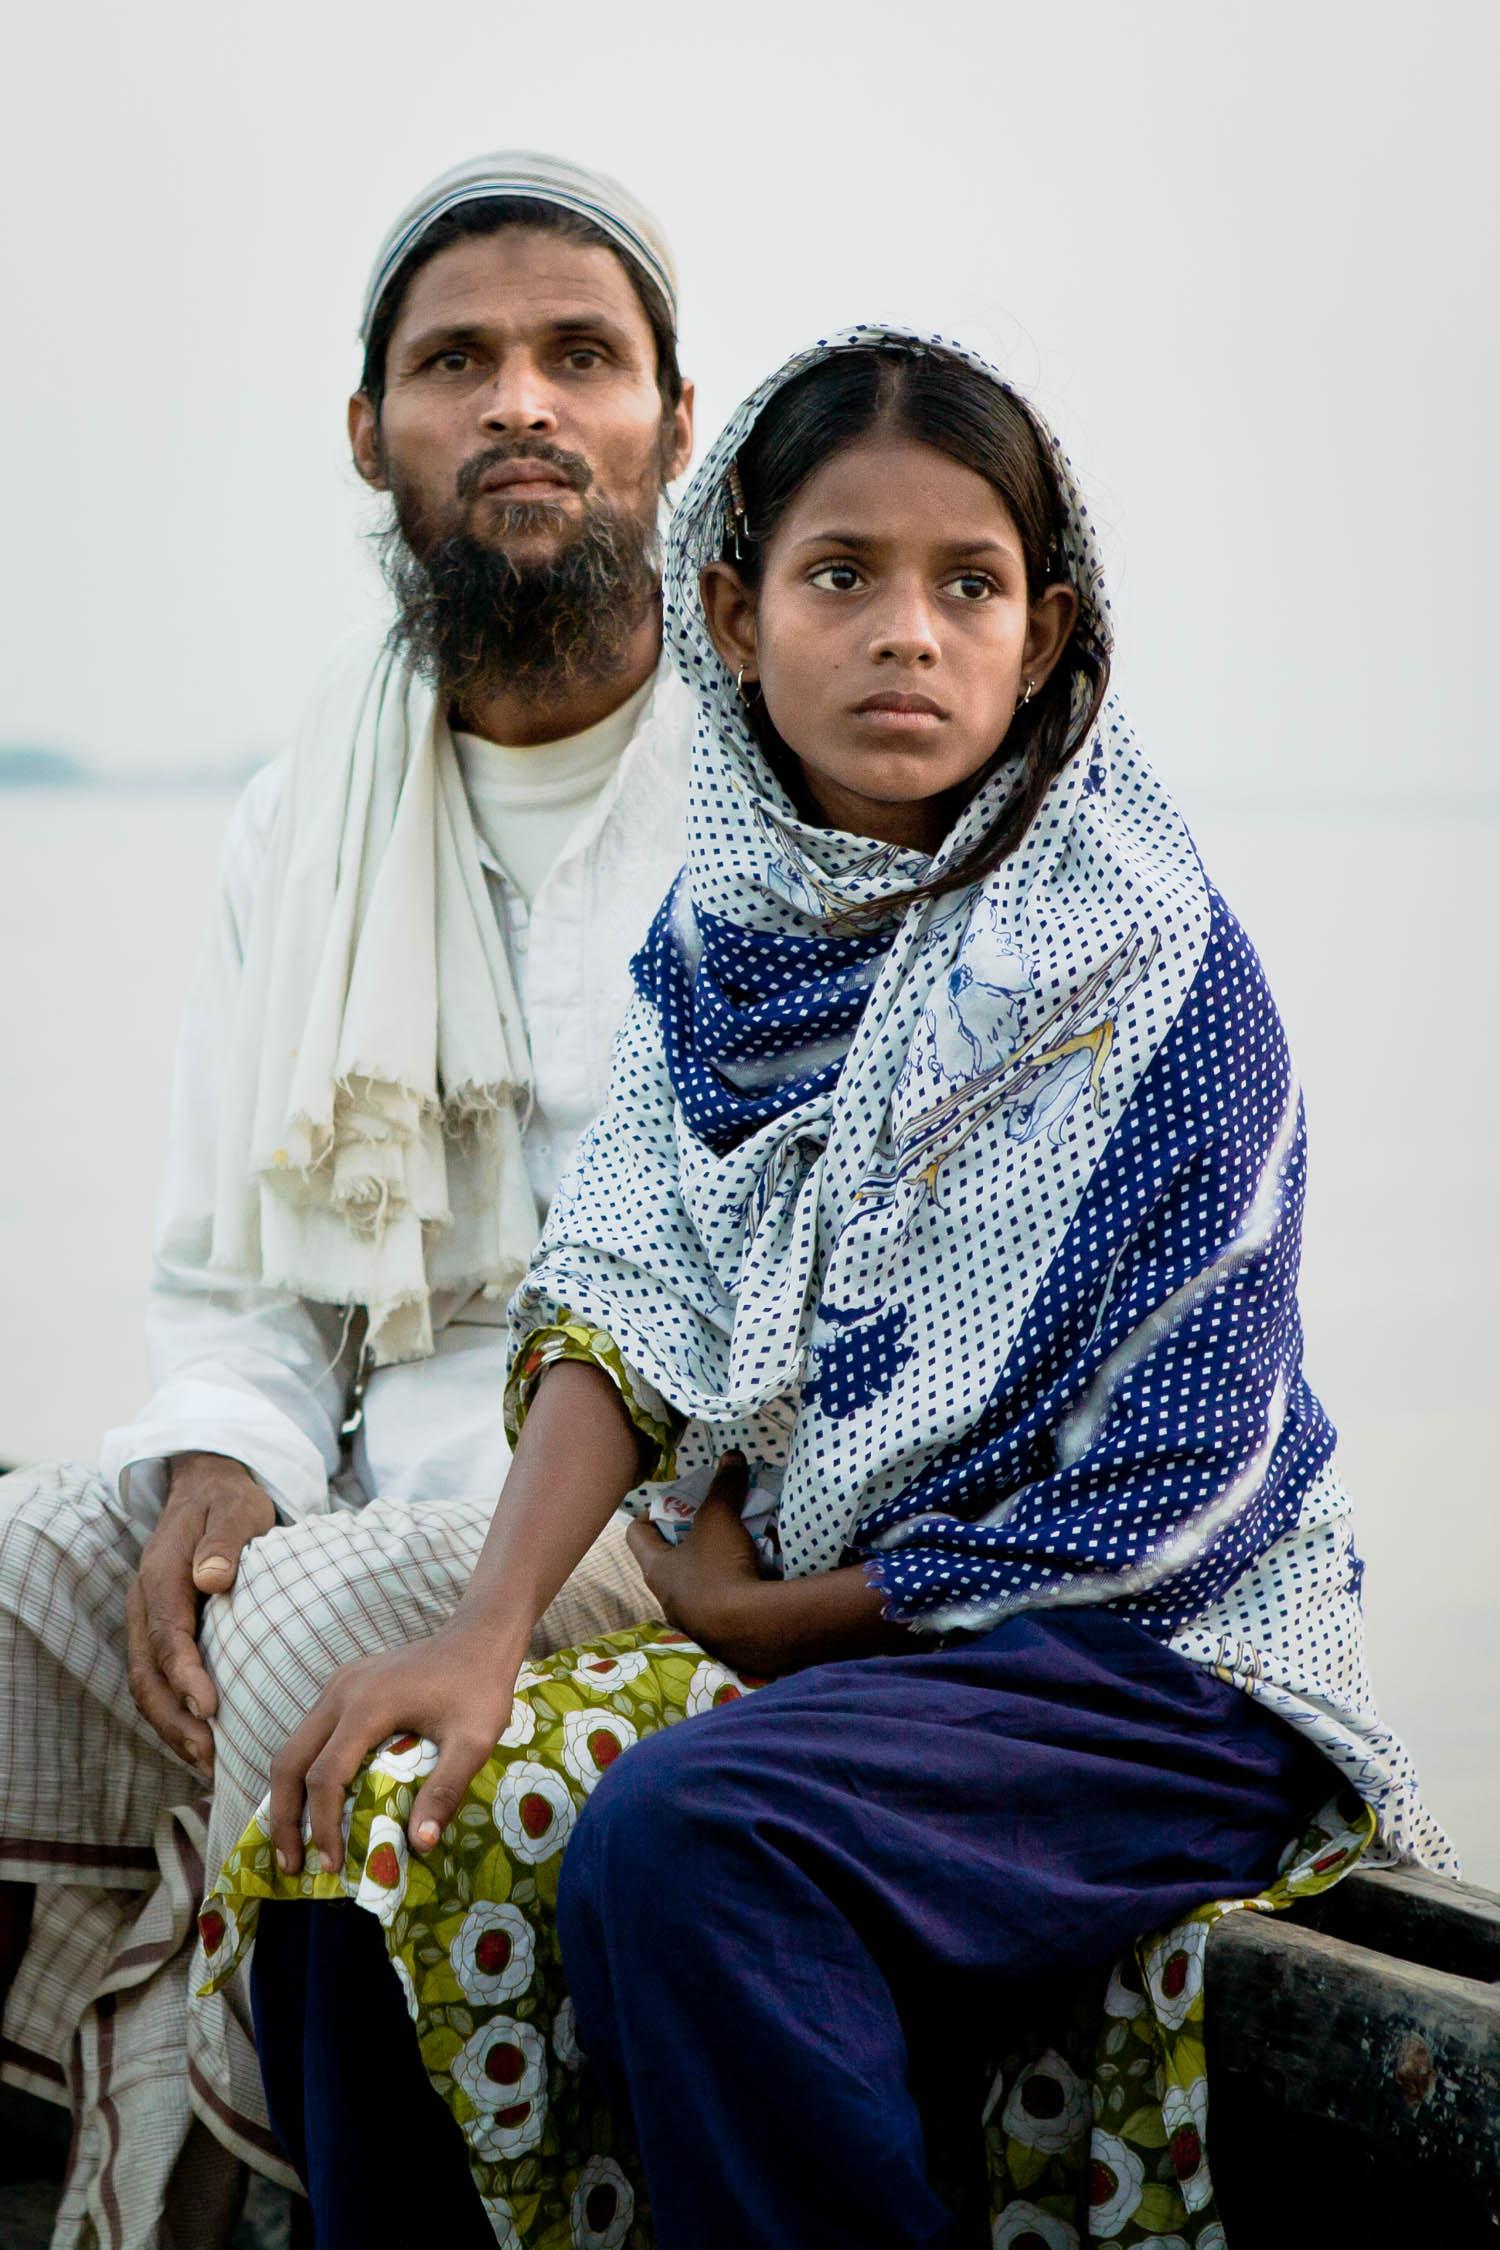 climate-migrants-bangladesh-maria-litwa-0142.jpg